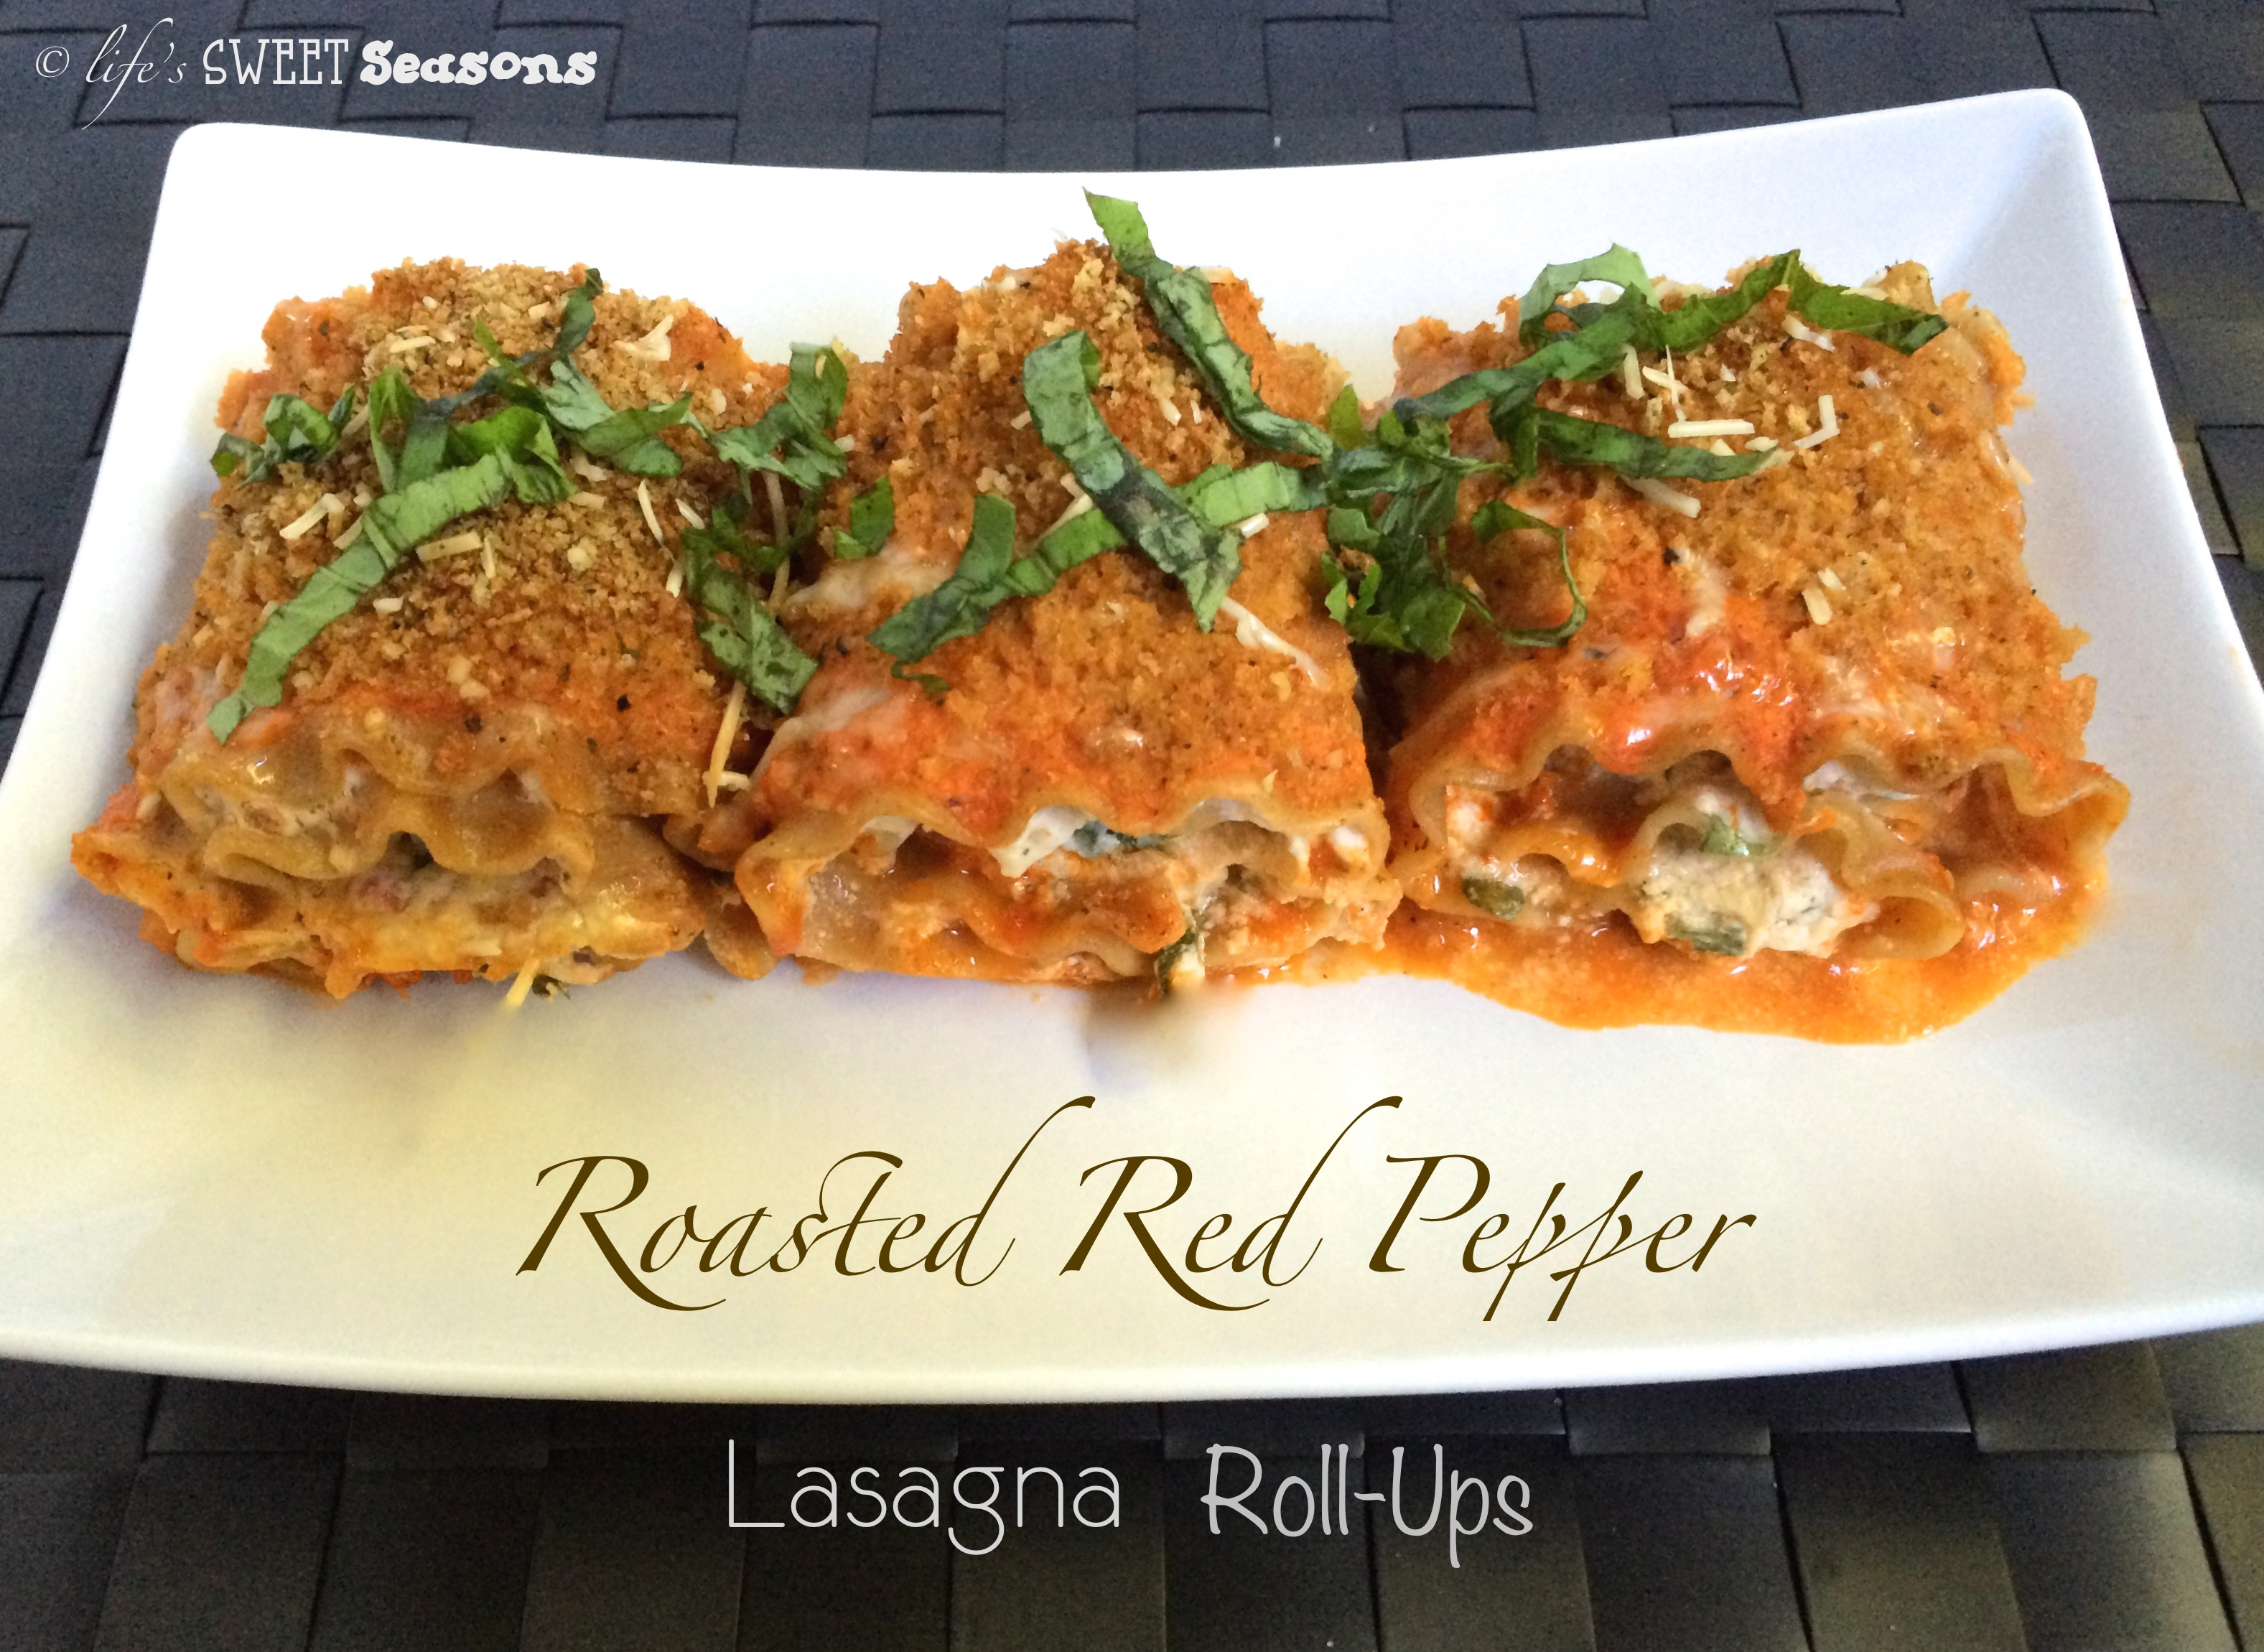 Roasted Red Pepper Lasagna Roll-Ups | Life's Sweet Seasons